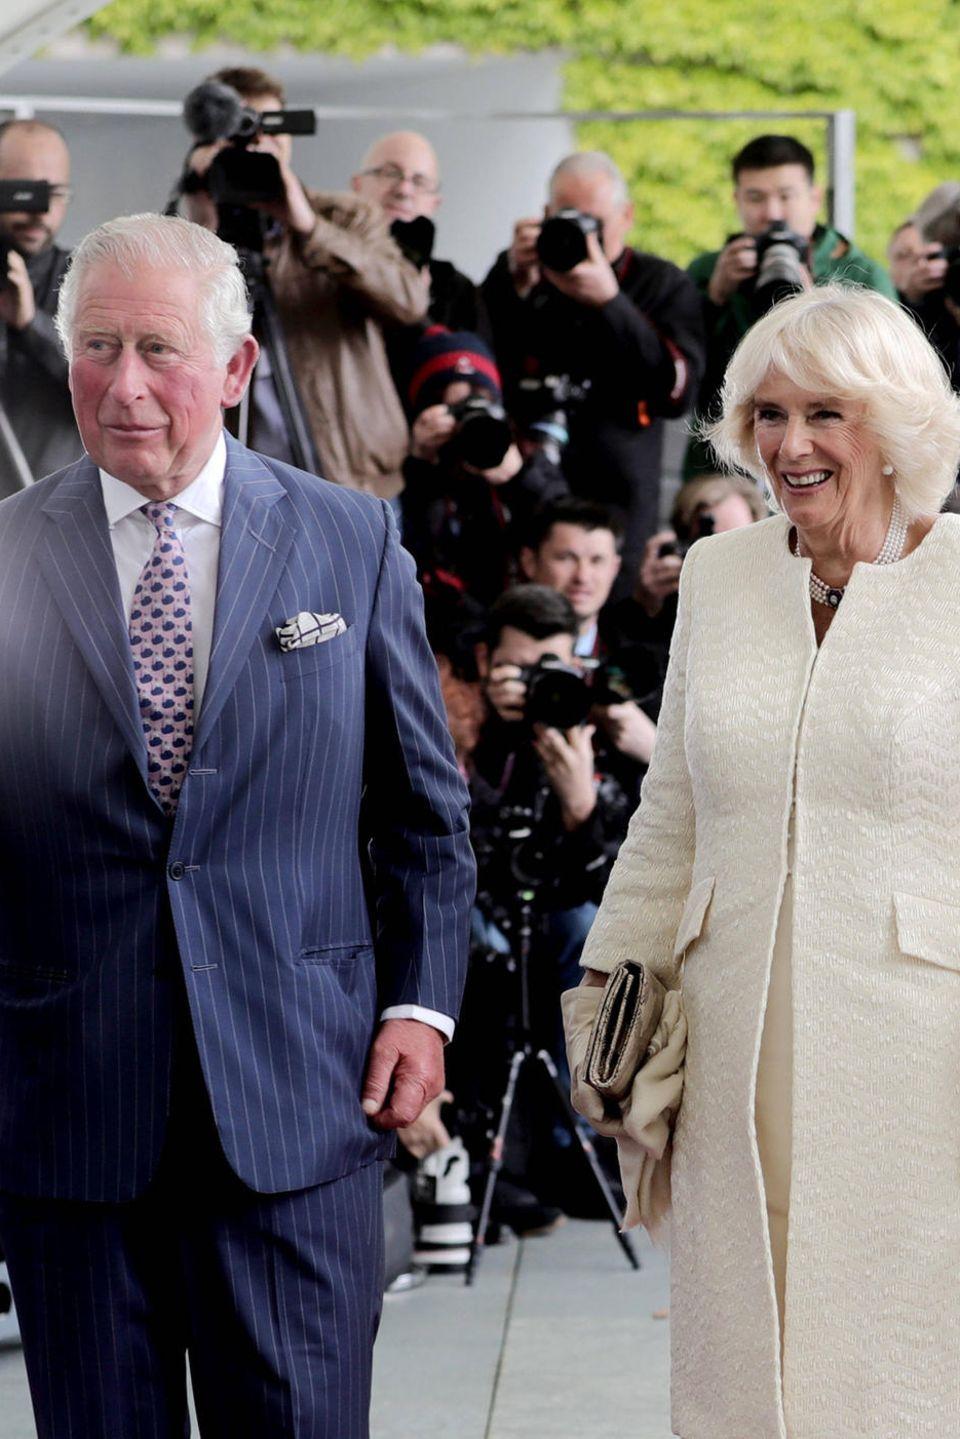 Prinz Charles, Herzogin Camilla, Angela Merkel